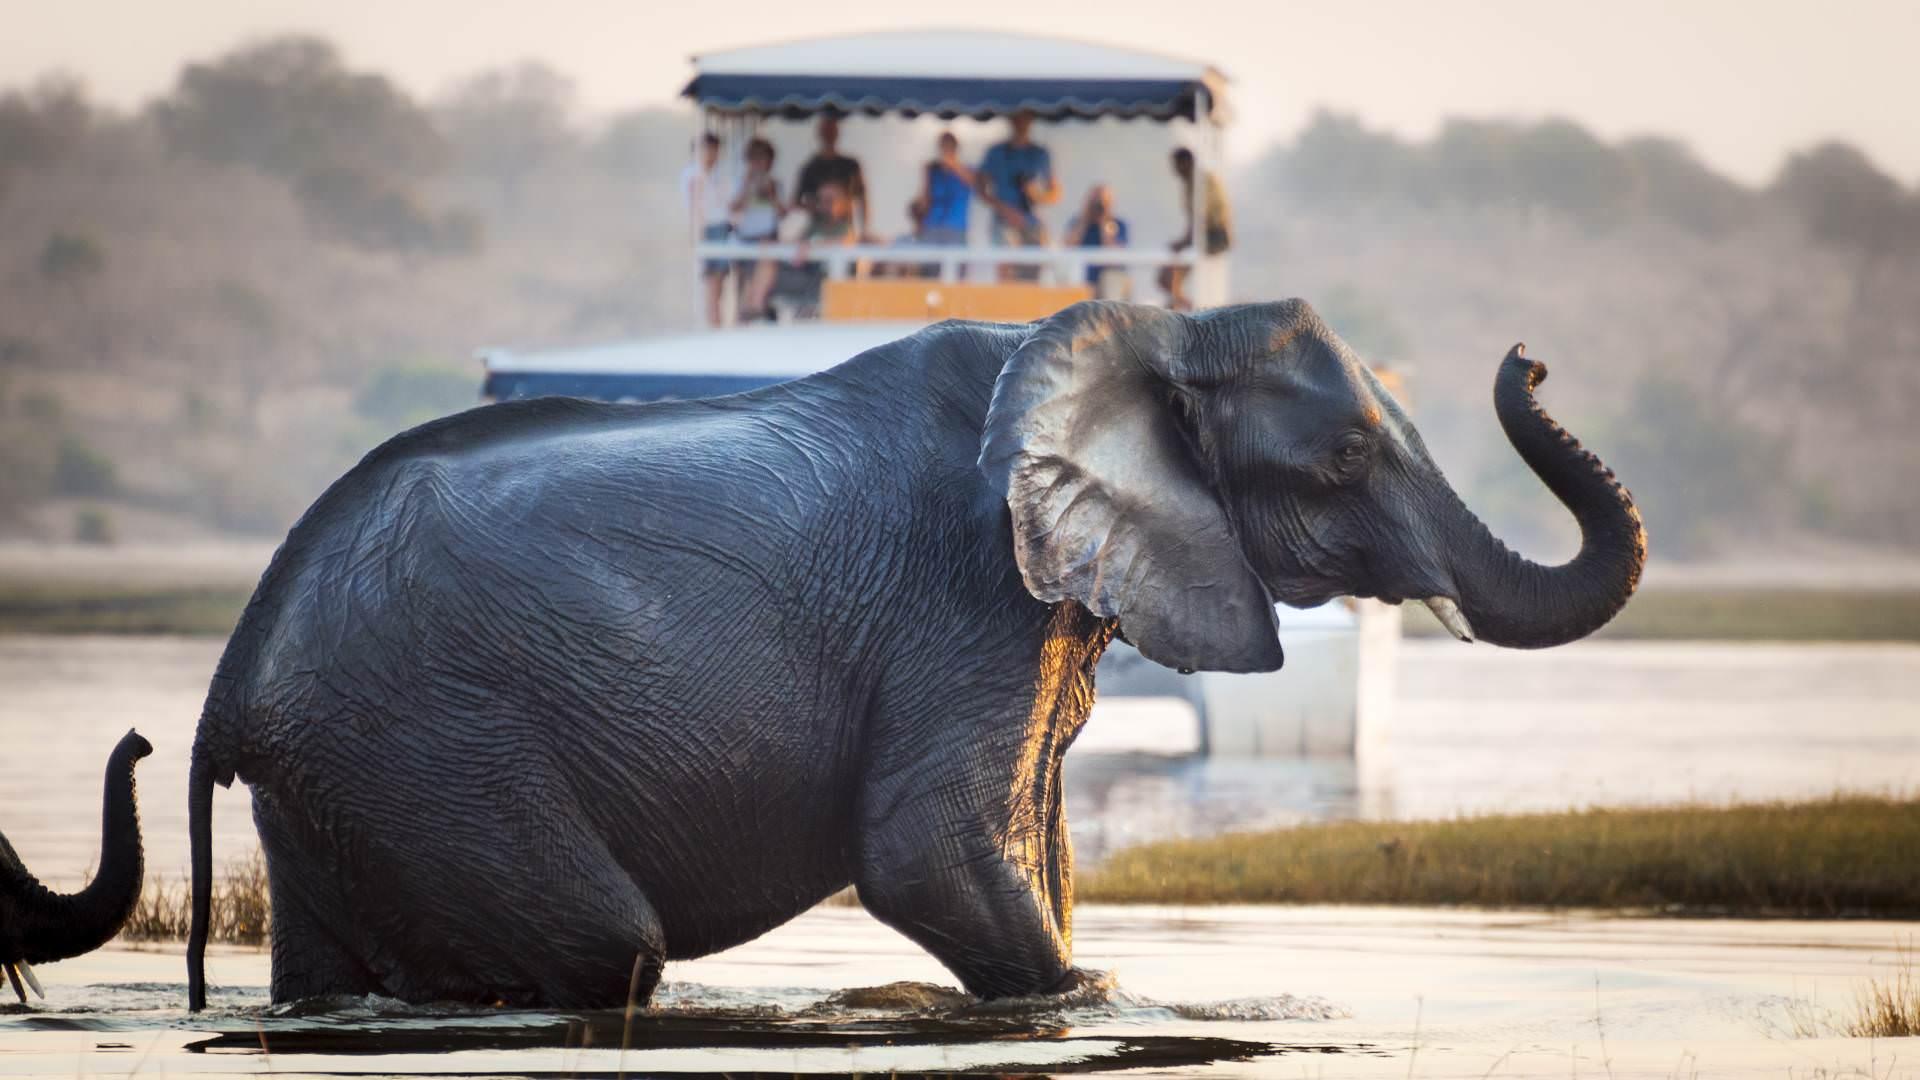 Elephant Chobe National Park in Botswana, Africa pintoafrica.com